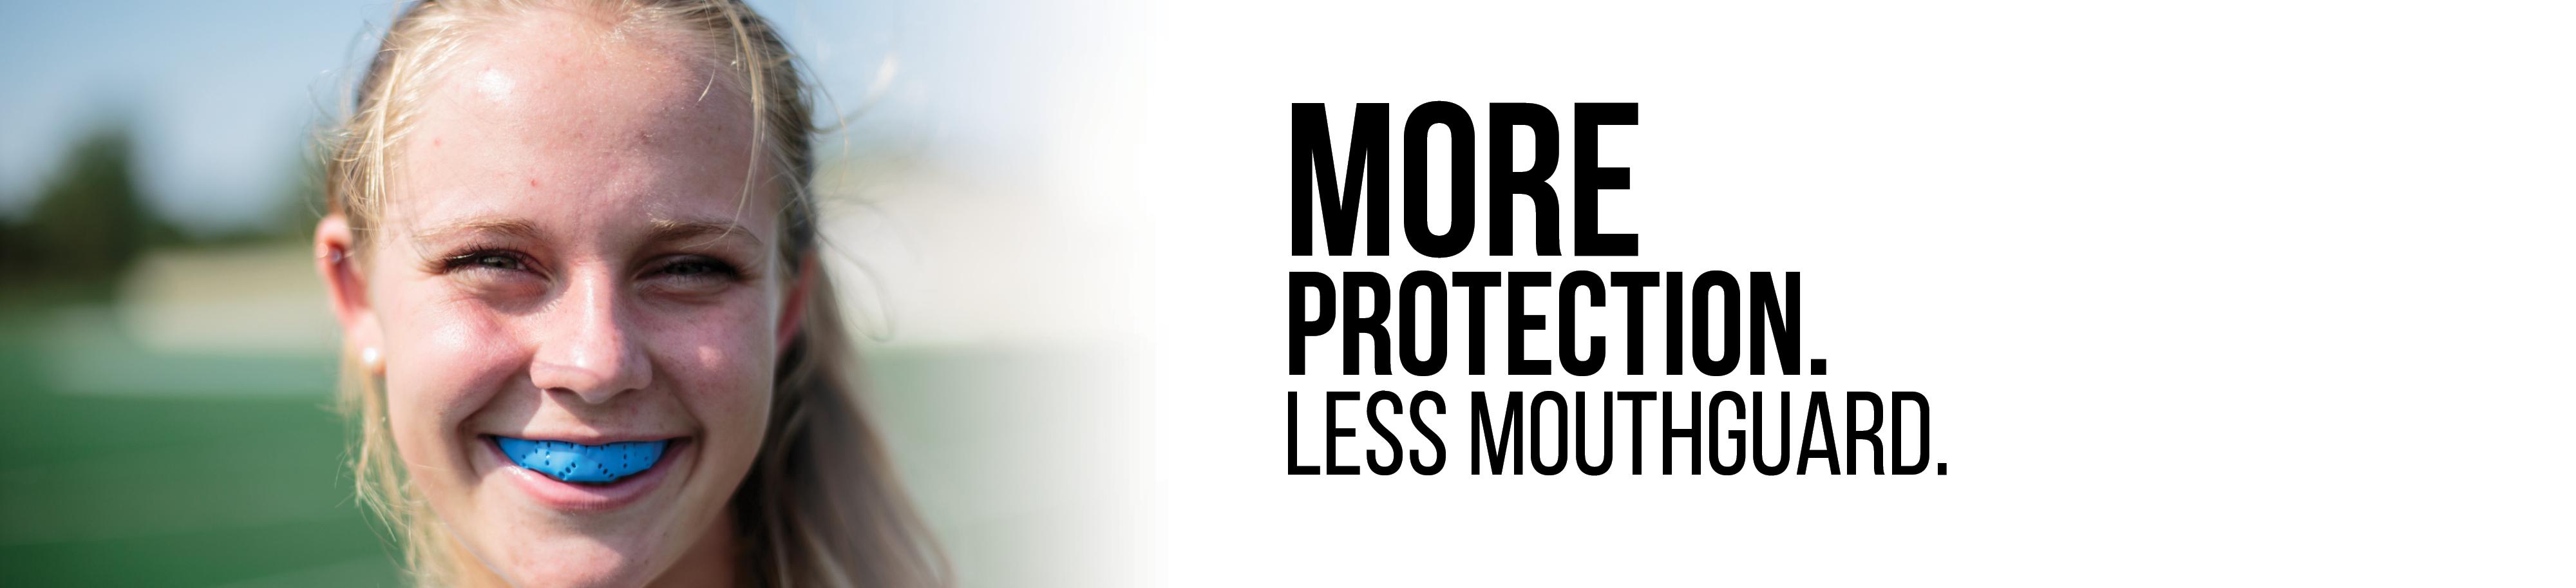 field hockey mouthguard protection